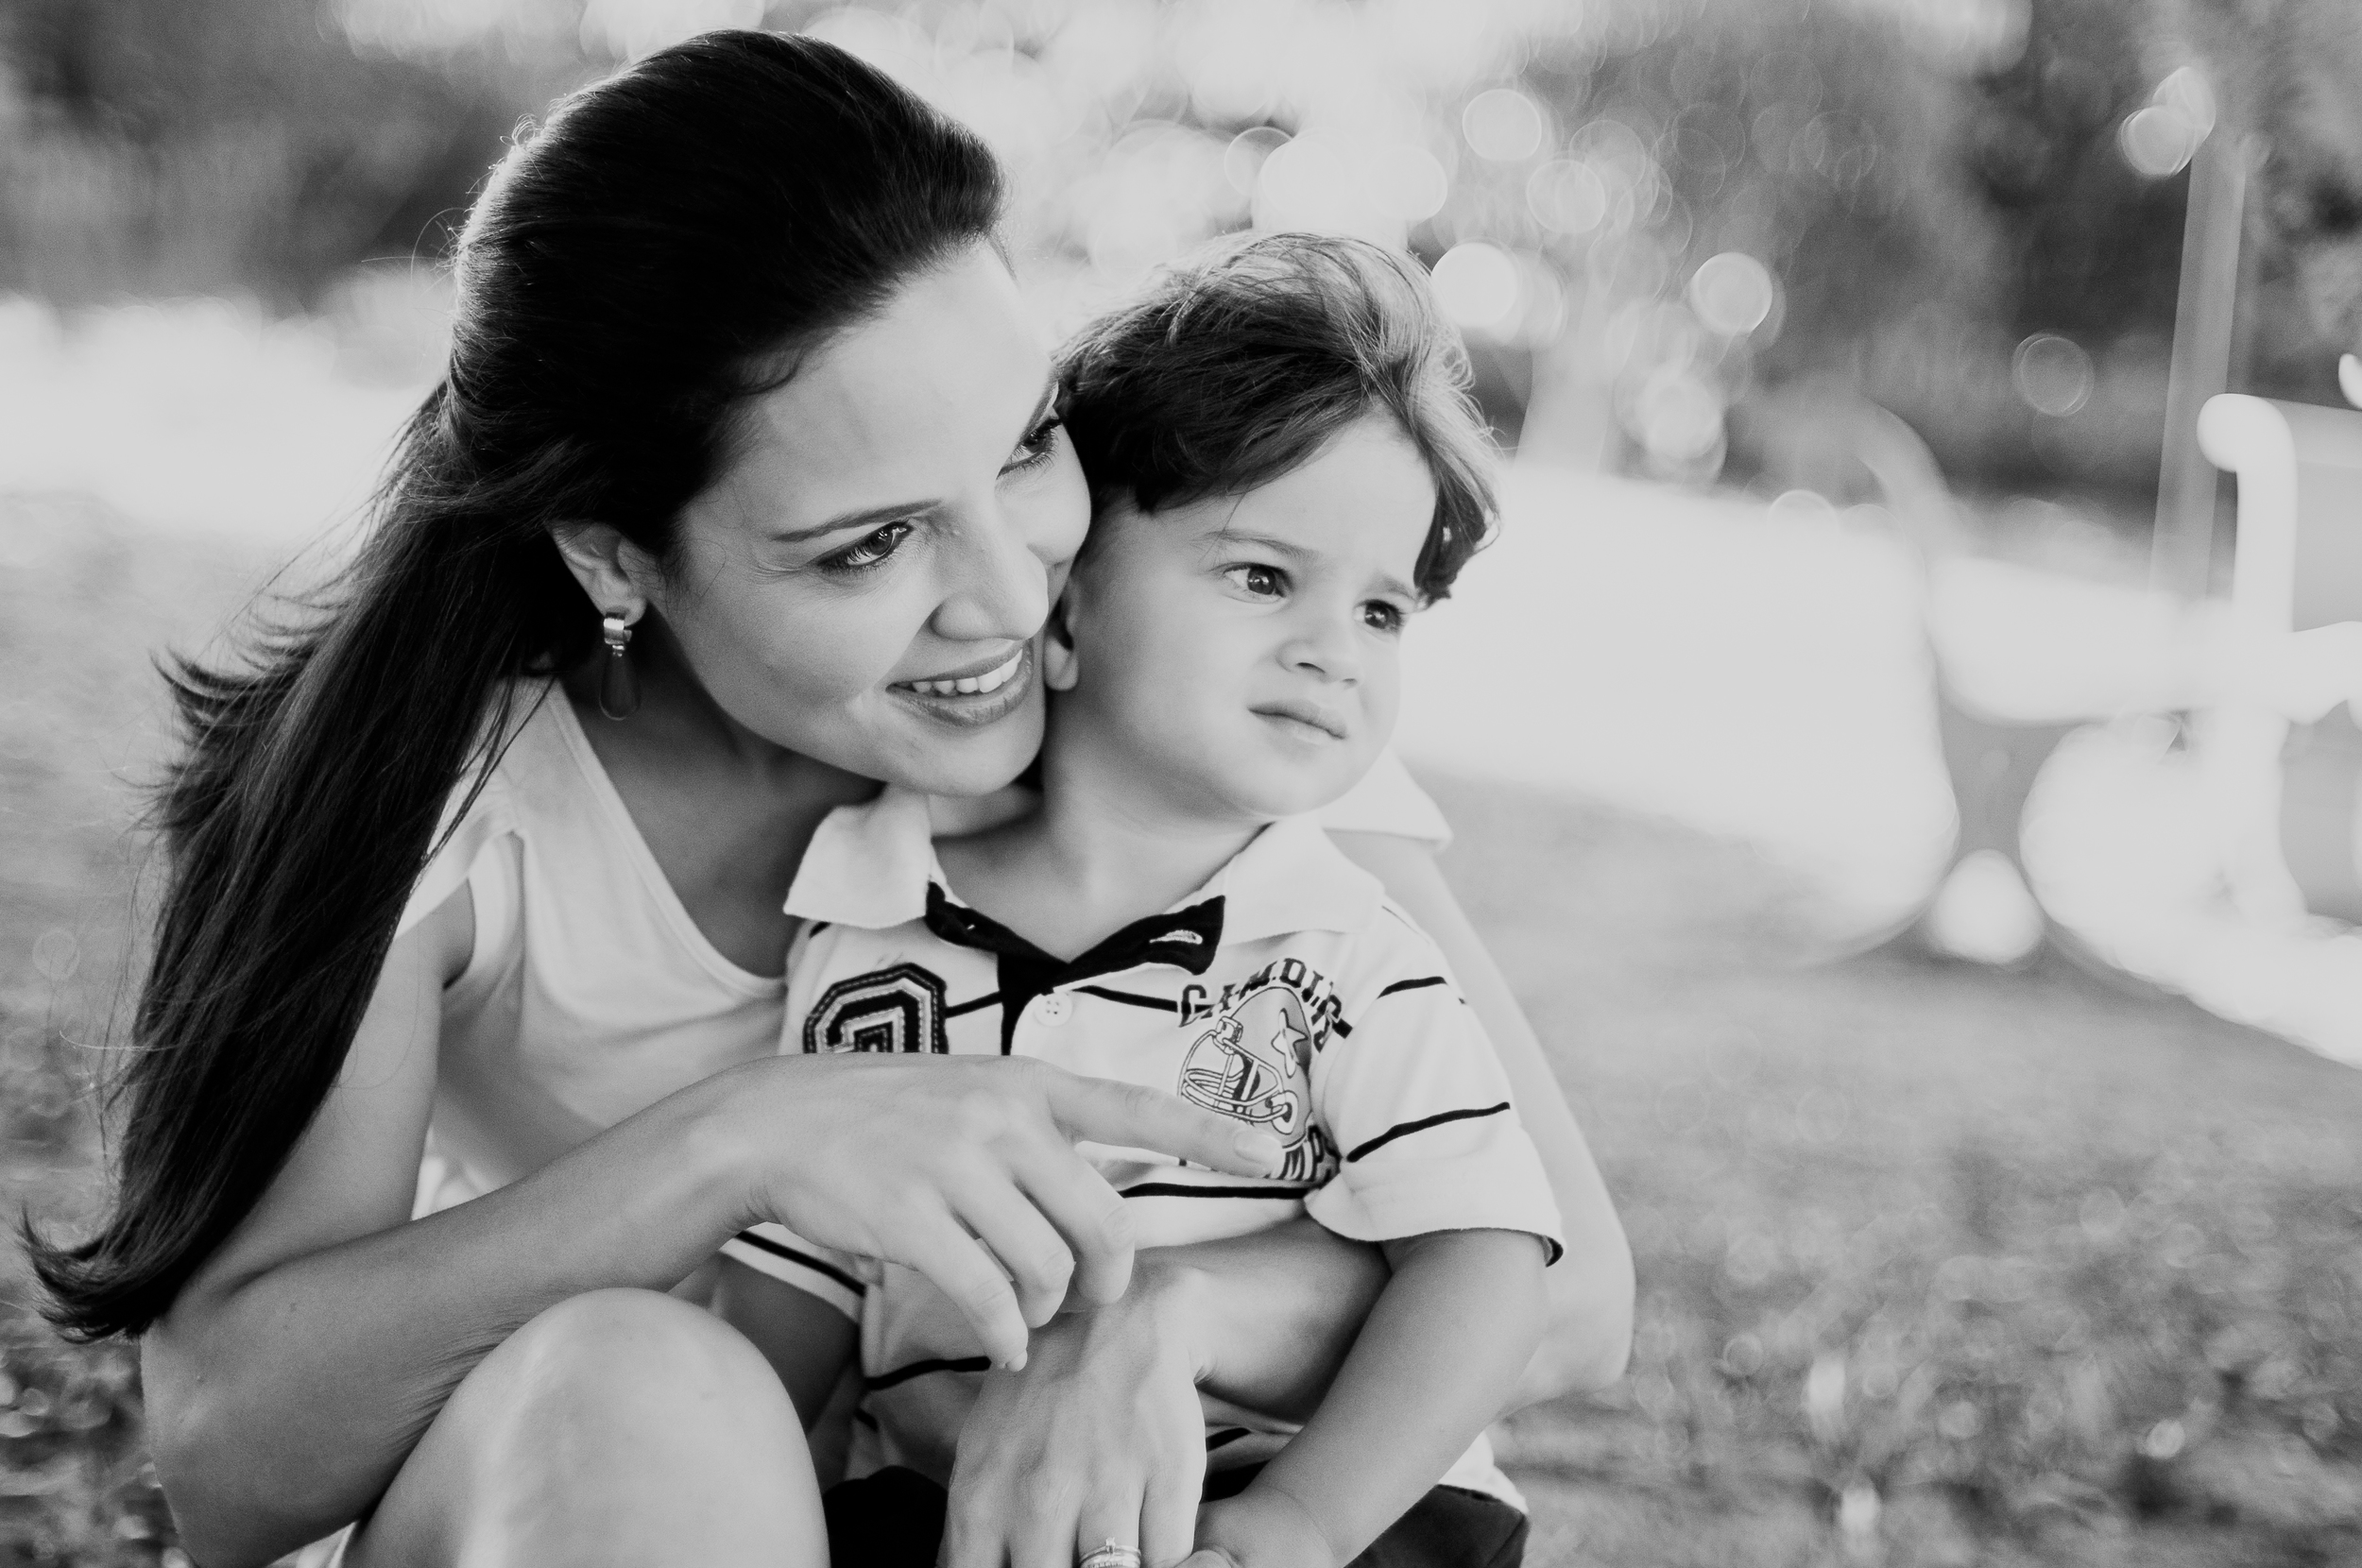 10_03_2012 -Isabella e família-26.jpg